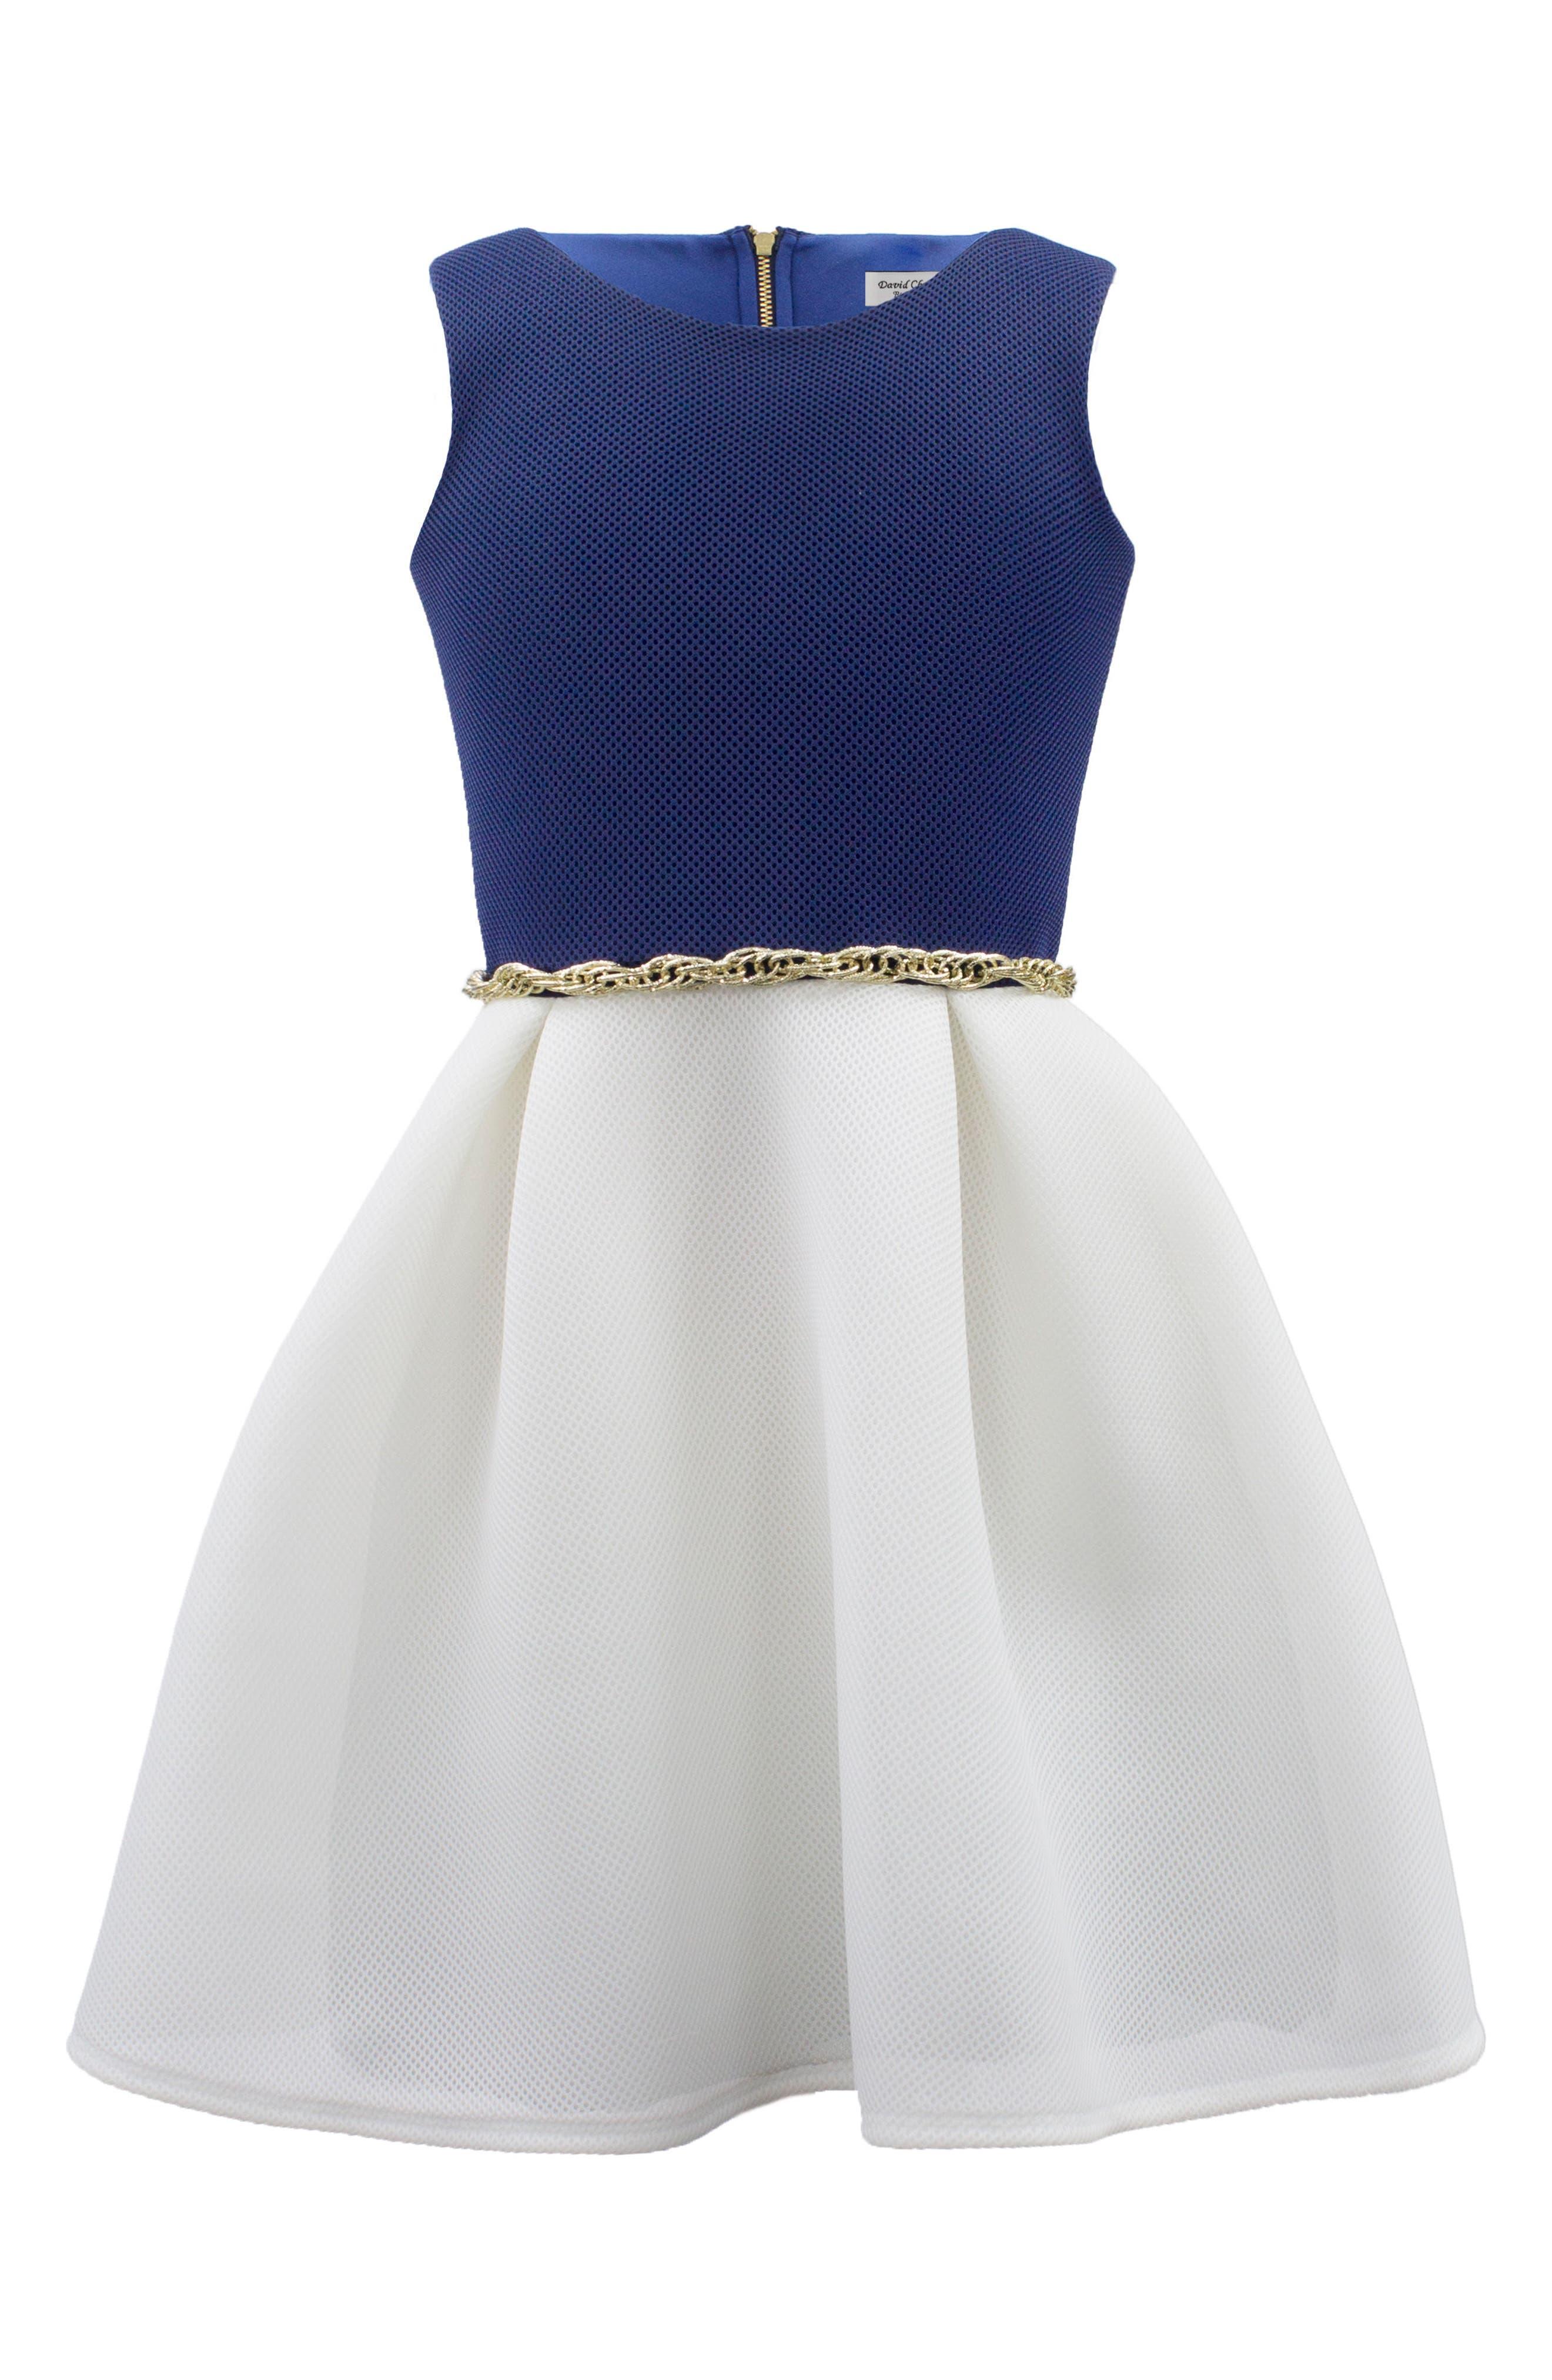 Colorblock Mesh Dress,                             Main thumbnail 1, color,                             Navy/ Ivory